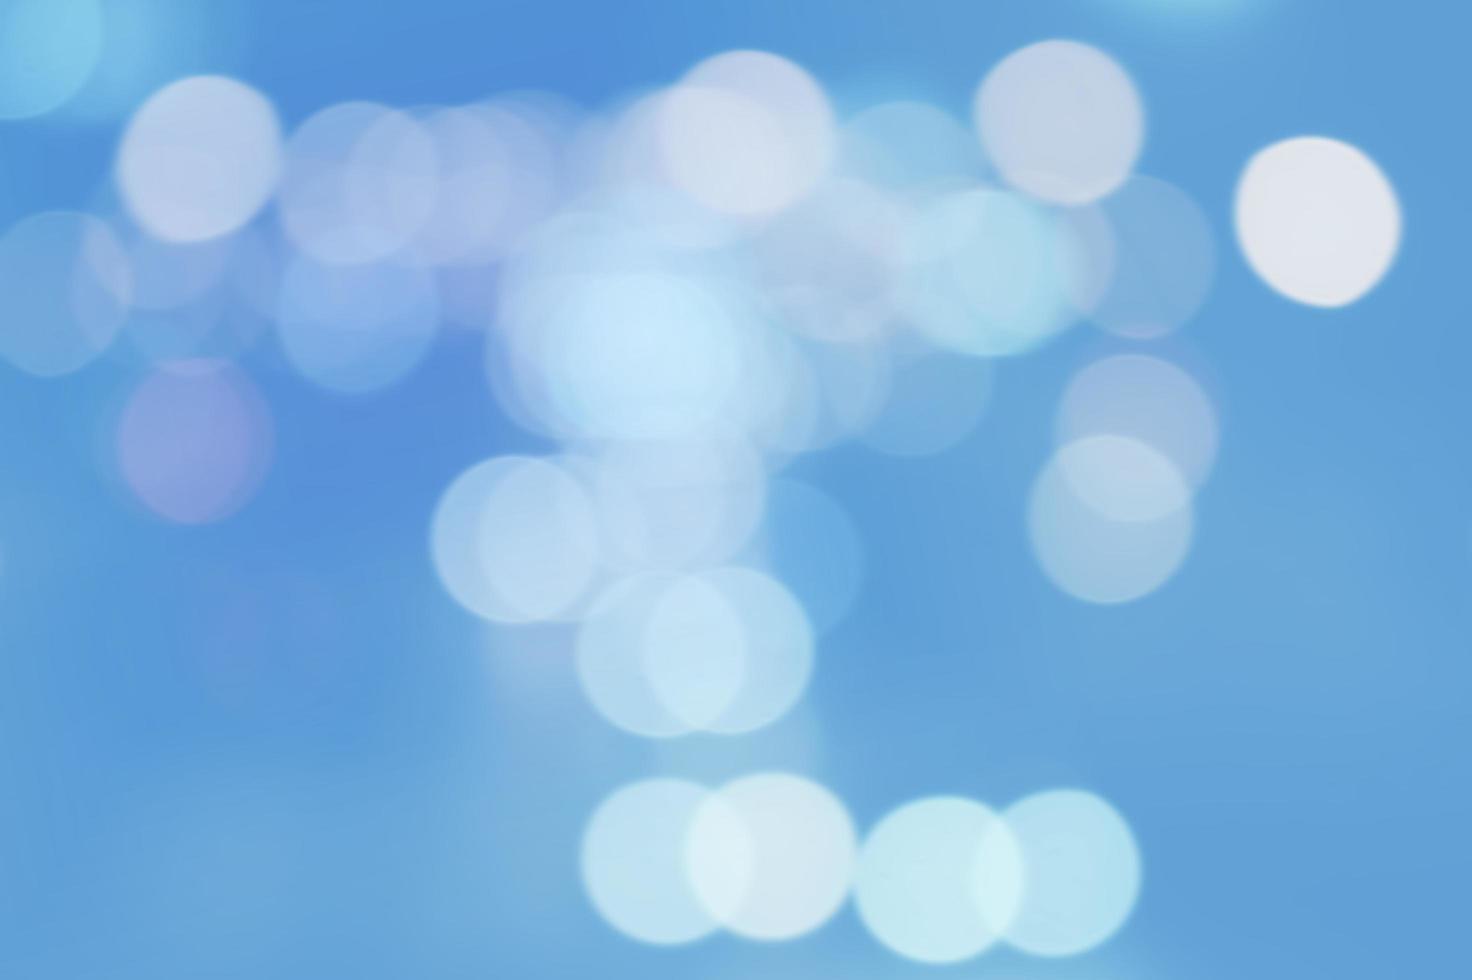 abstraktes blaues Bokeh foto